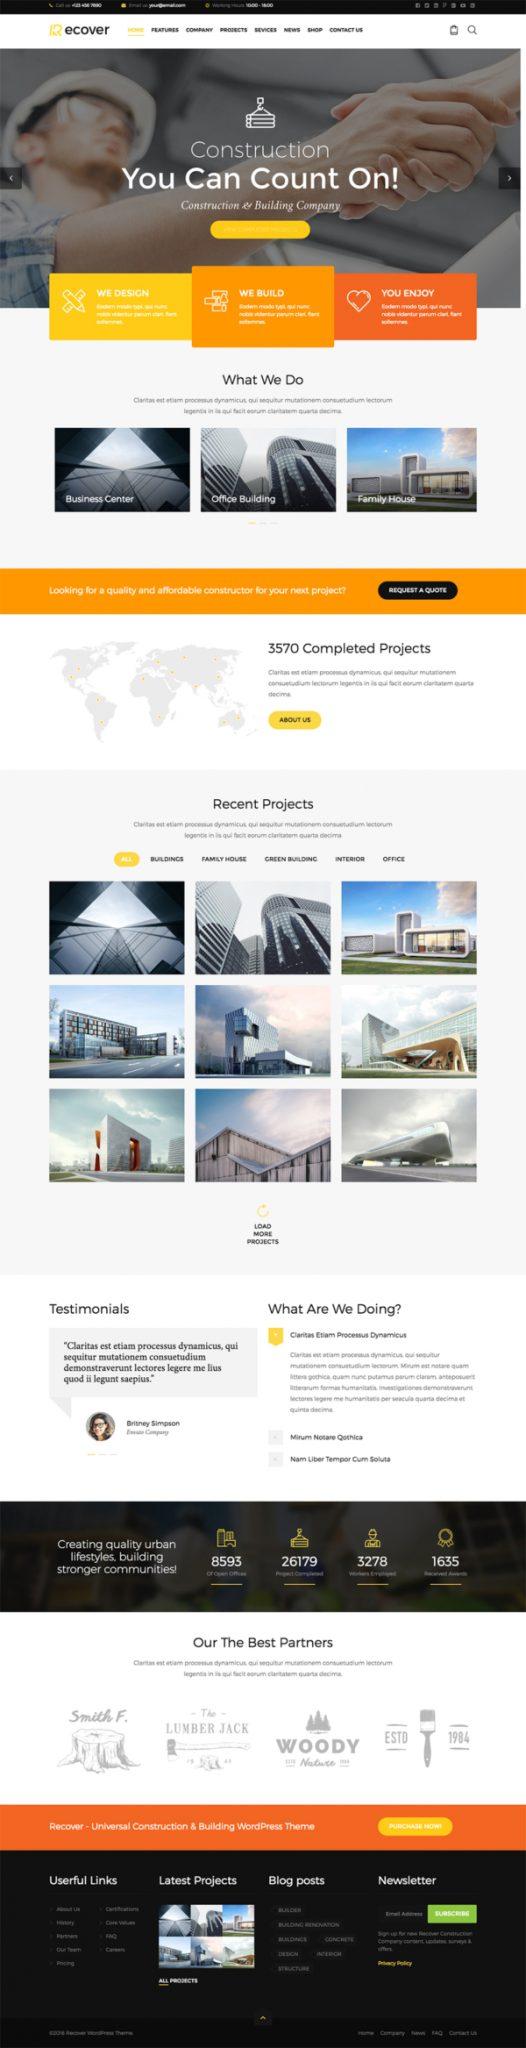 Thiết kế web công ty xây dựng Recover